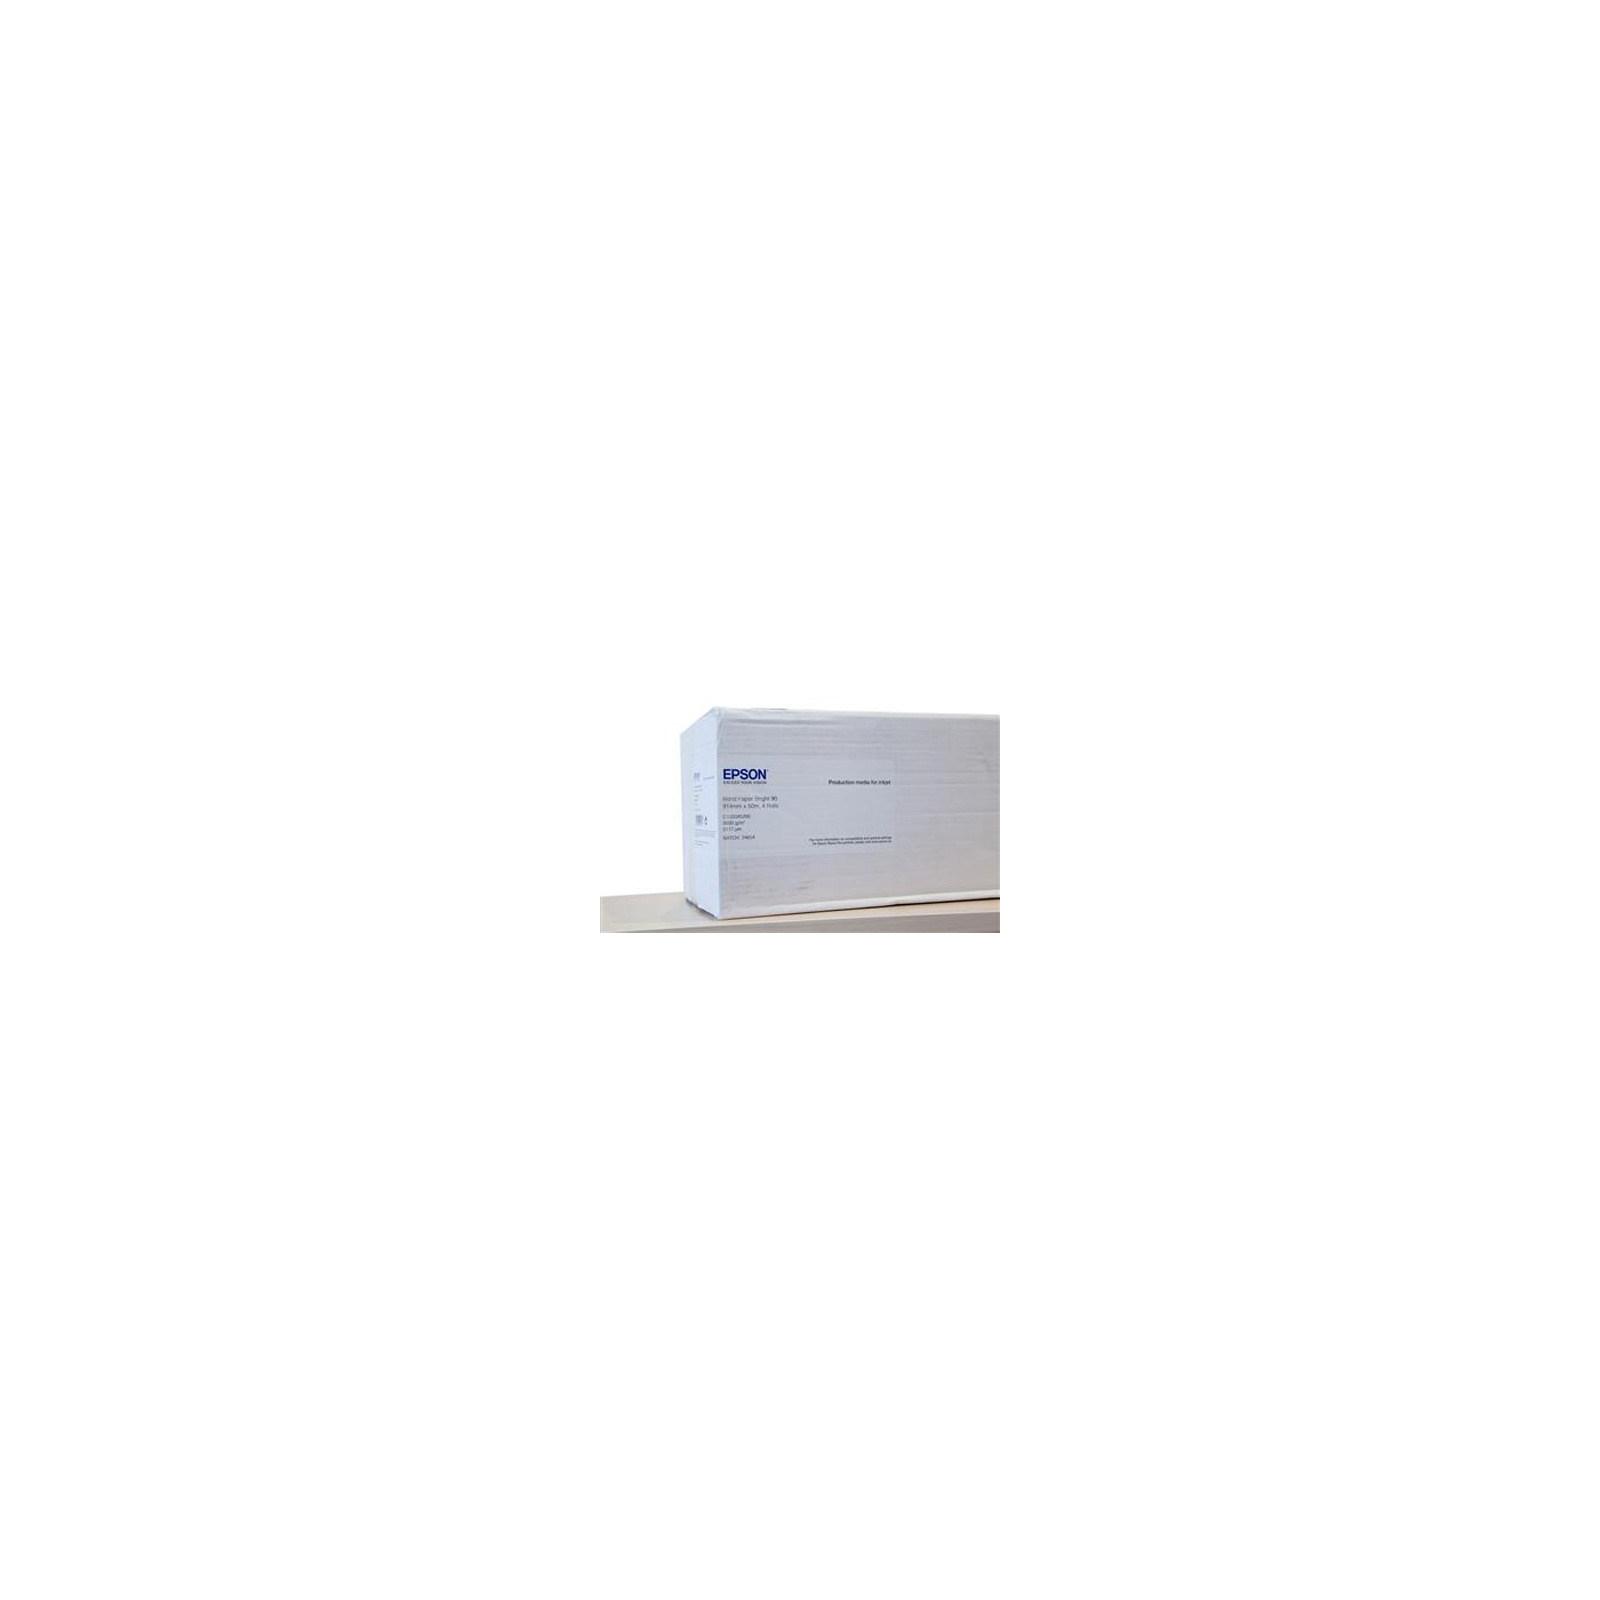 "Бумага EPSON 36"" Bond Paper Satin (C13S045283)"